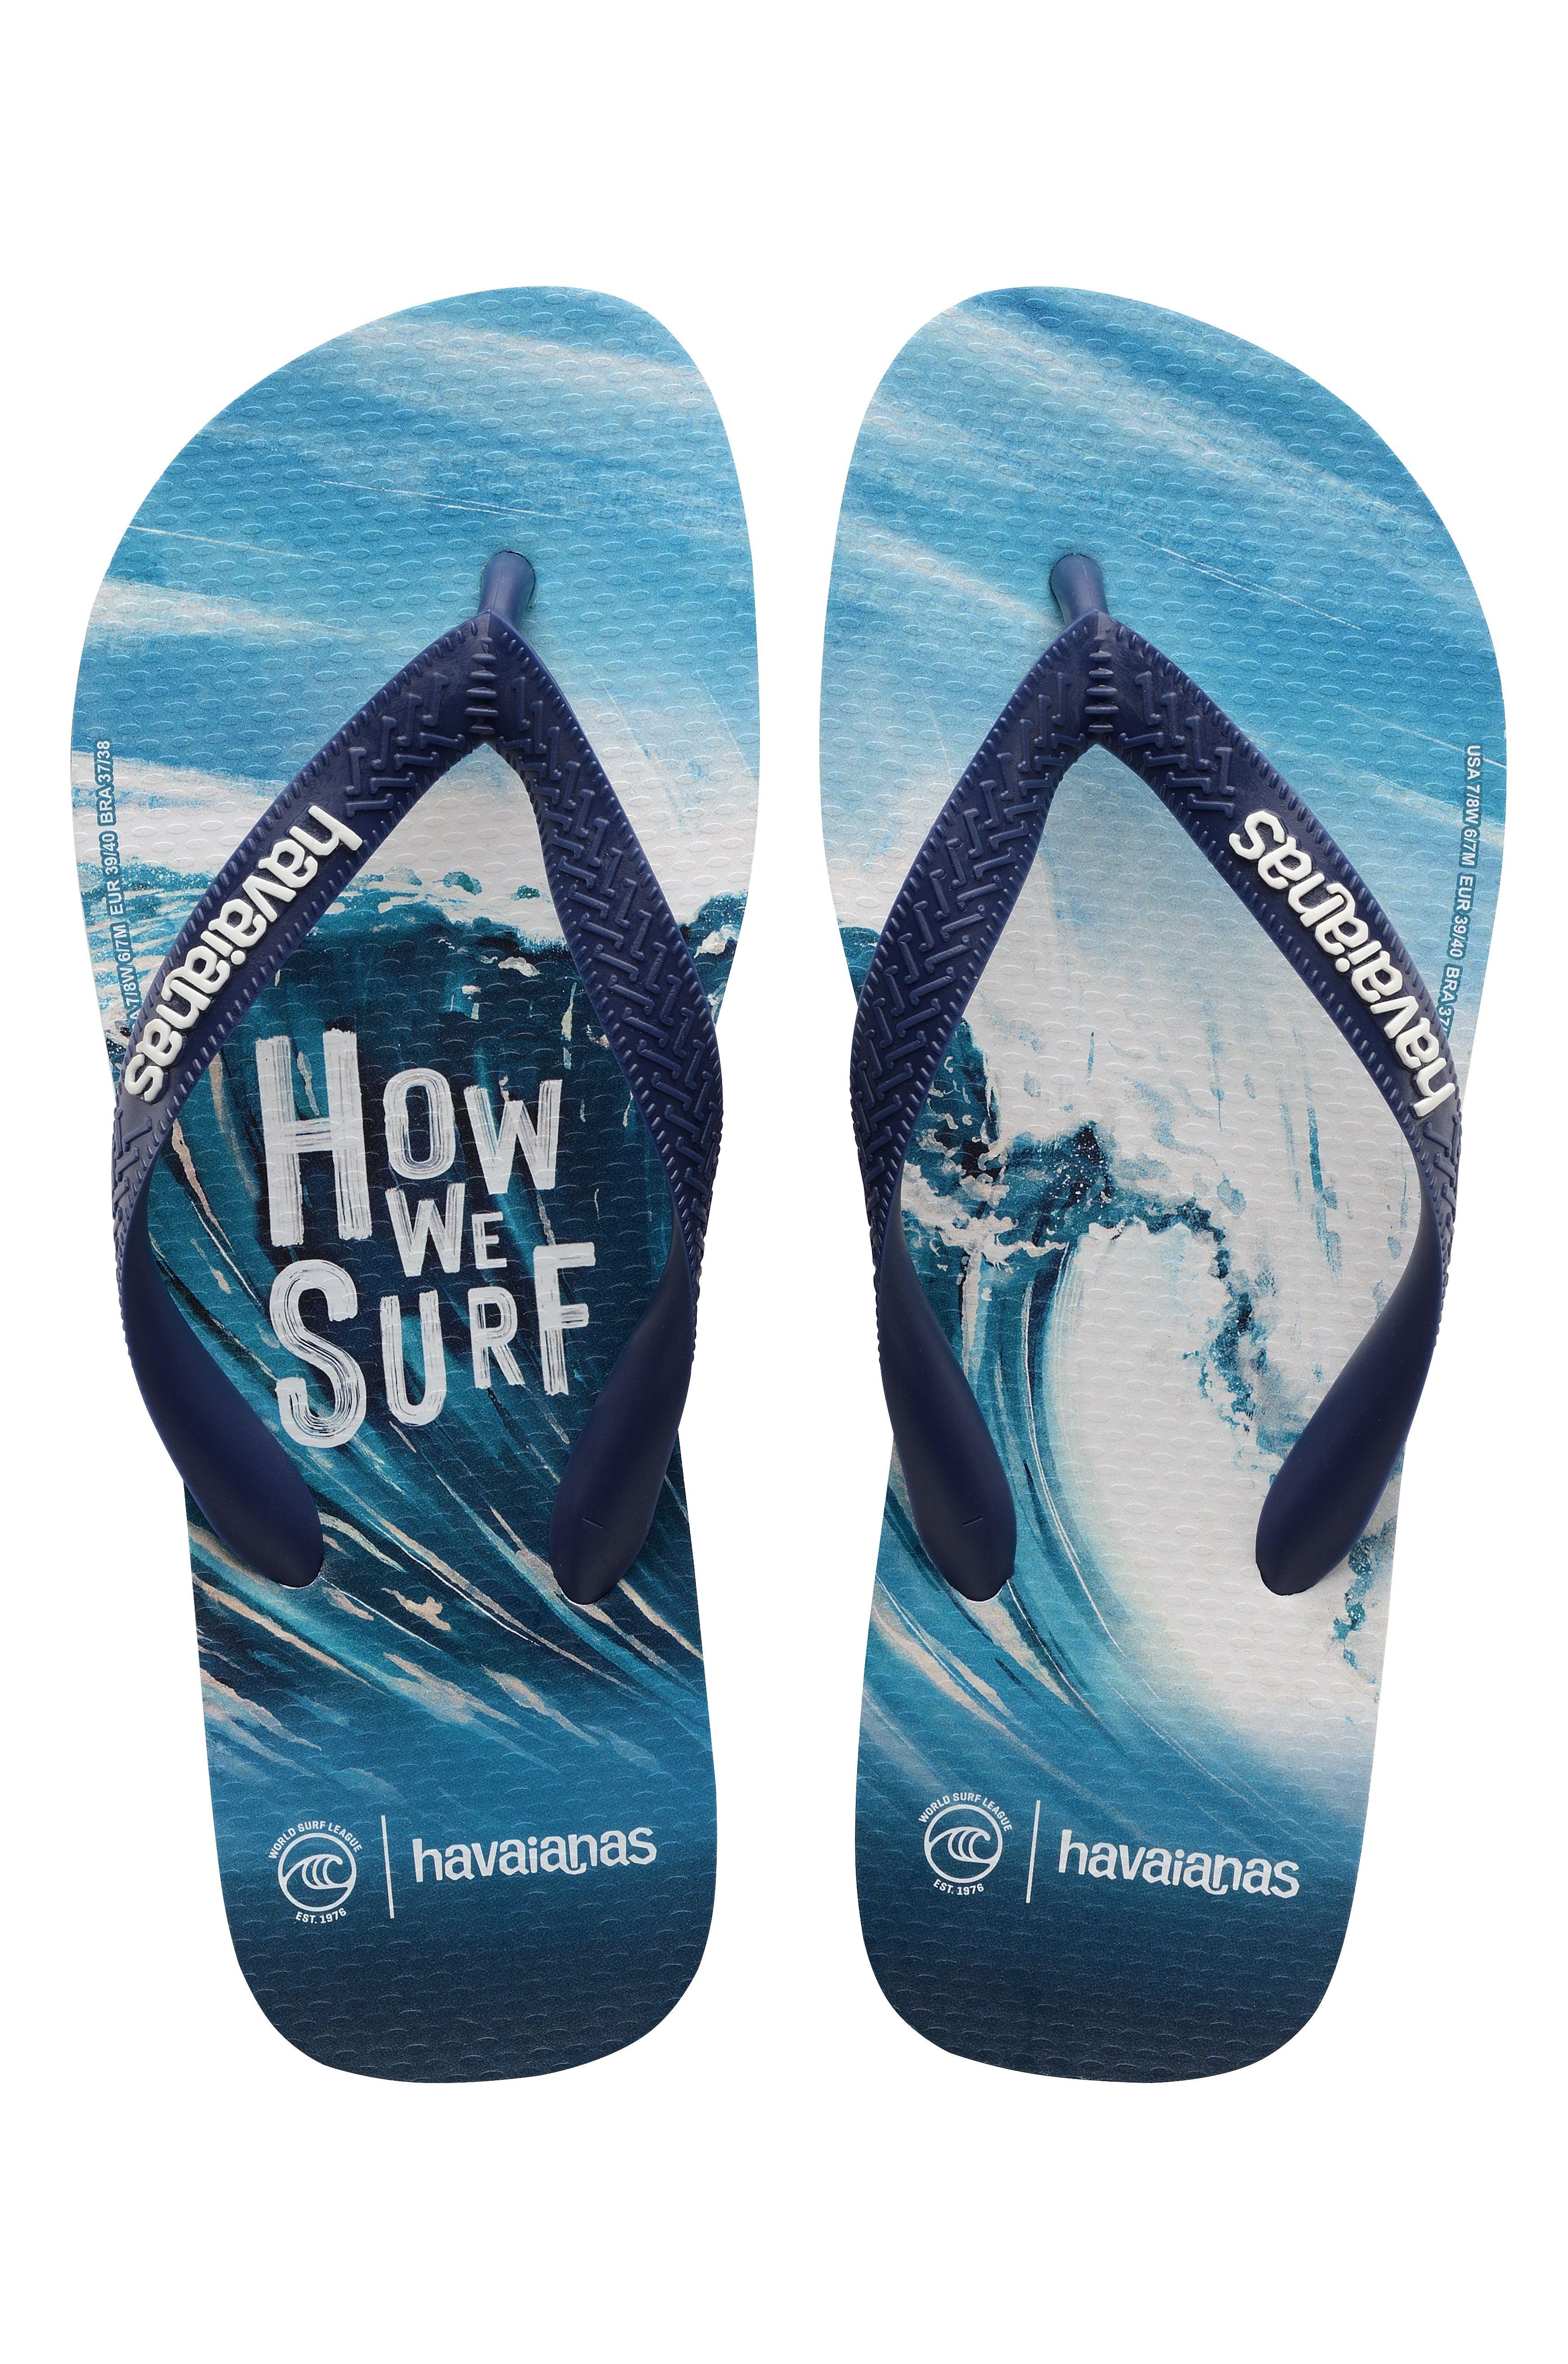 Havaianas Sandals TOP WSL HOW WE SURF Navy Blue